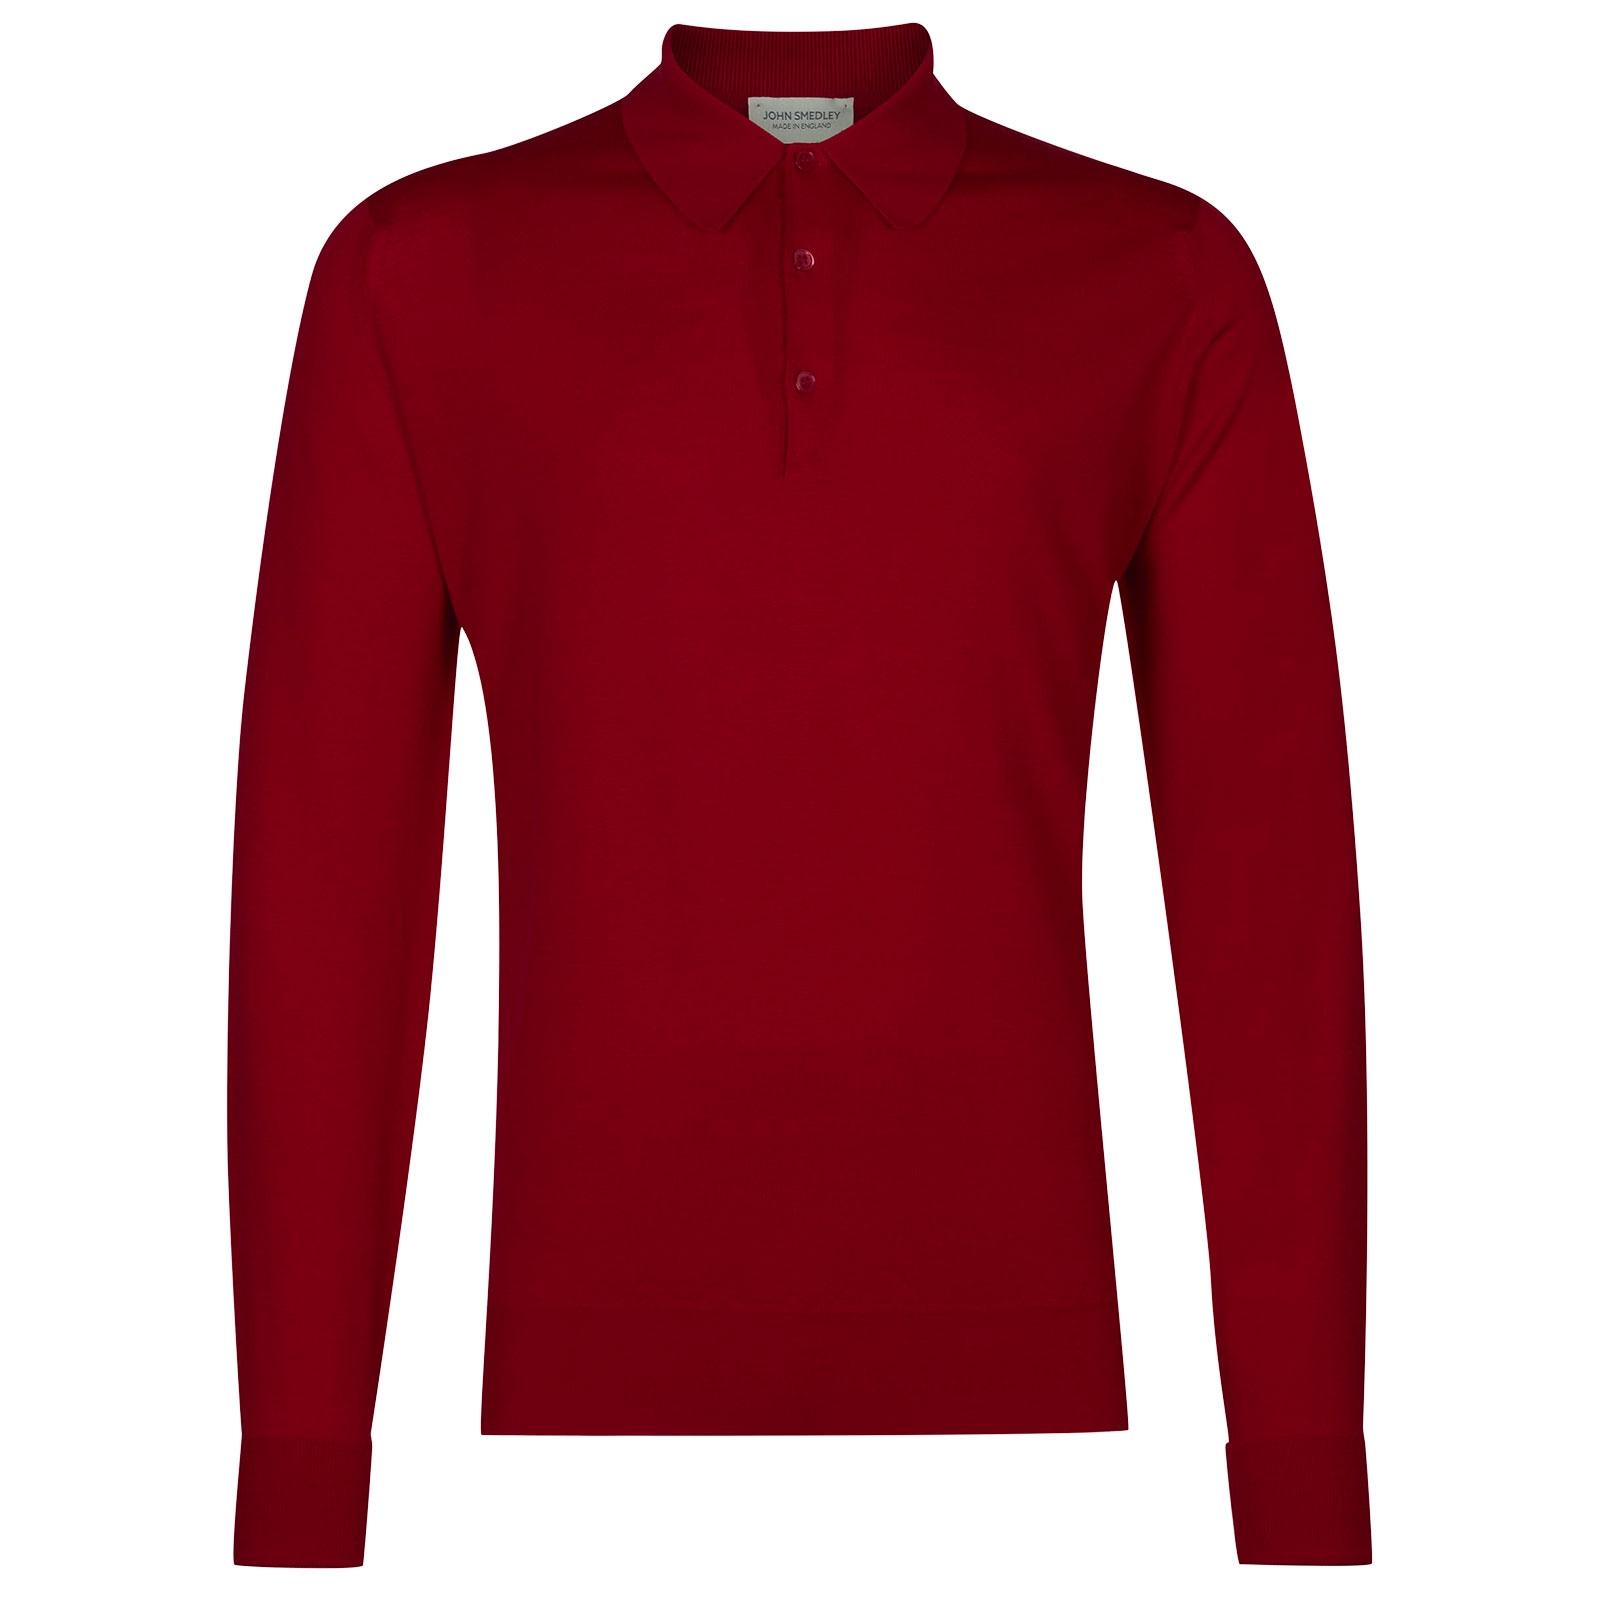 John Smedley Dorset Merino Wool Shirt in Thermal Red-XL